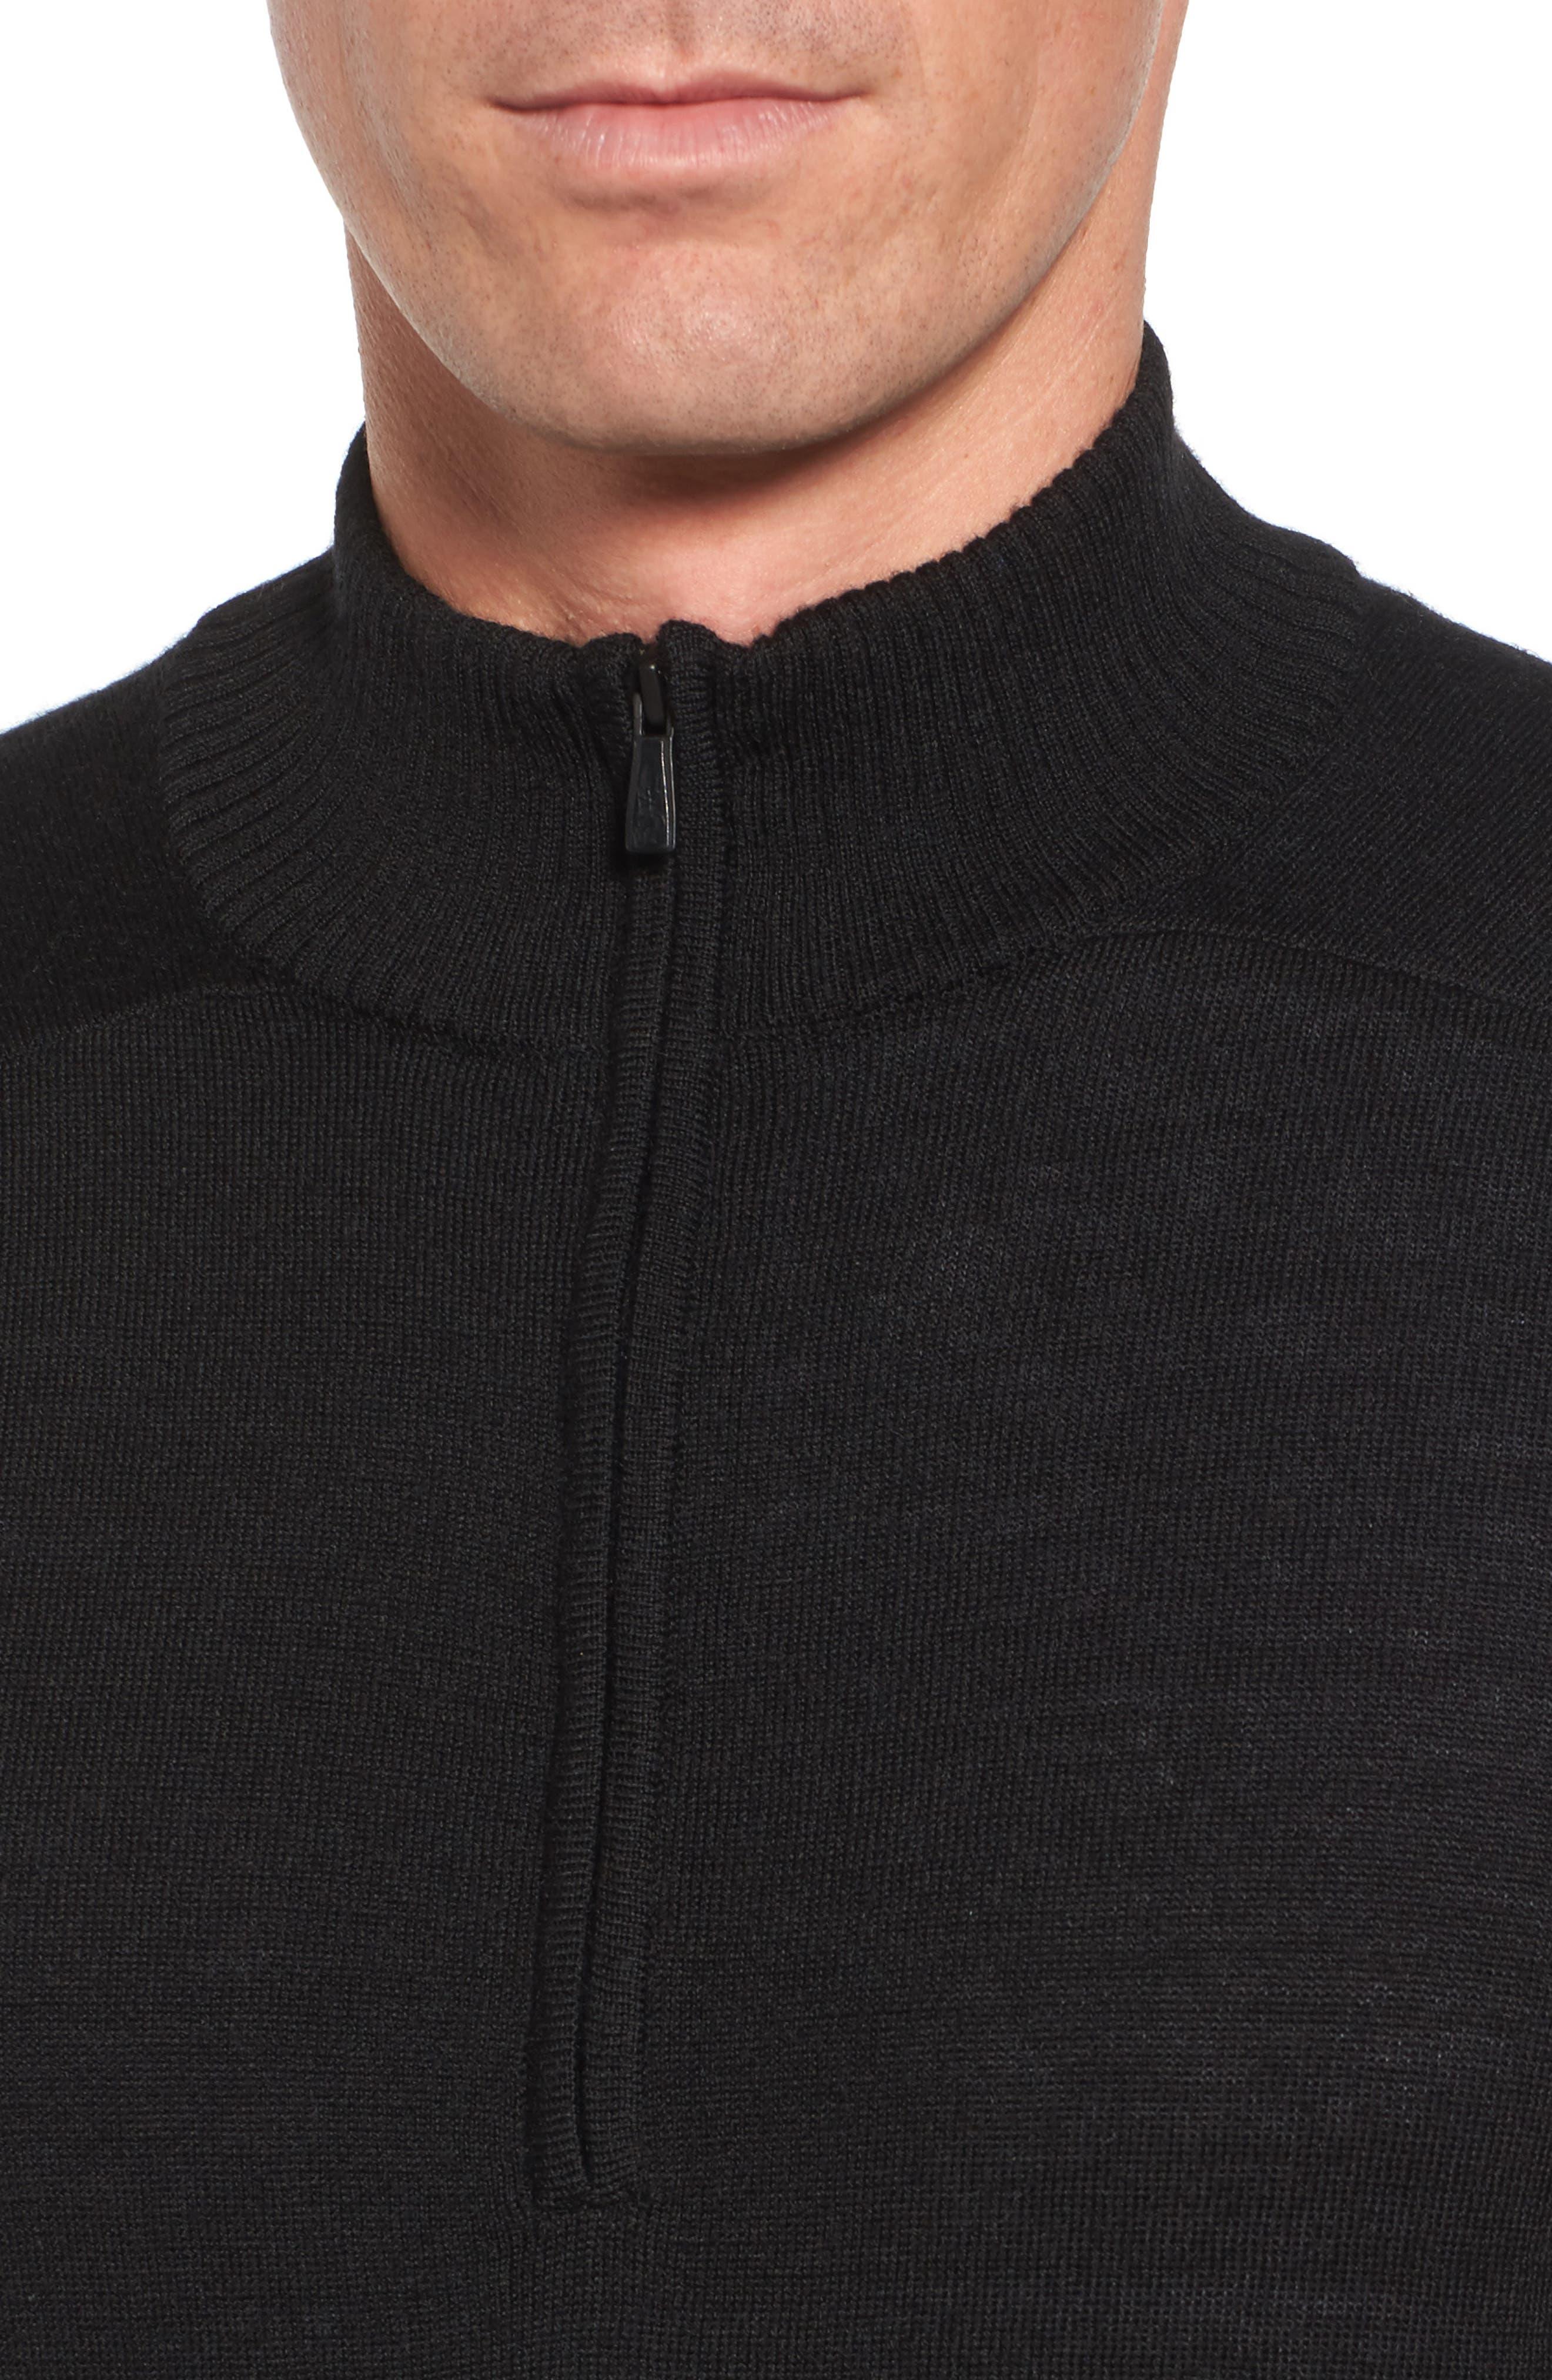 Kiva Ridge Merino Wool Blend Pullover,                             Alternate thumbnail 4, color,                             001